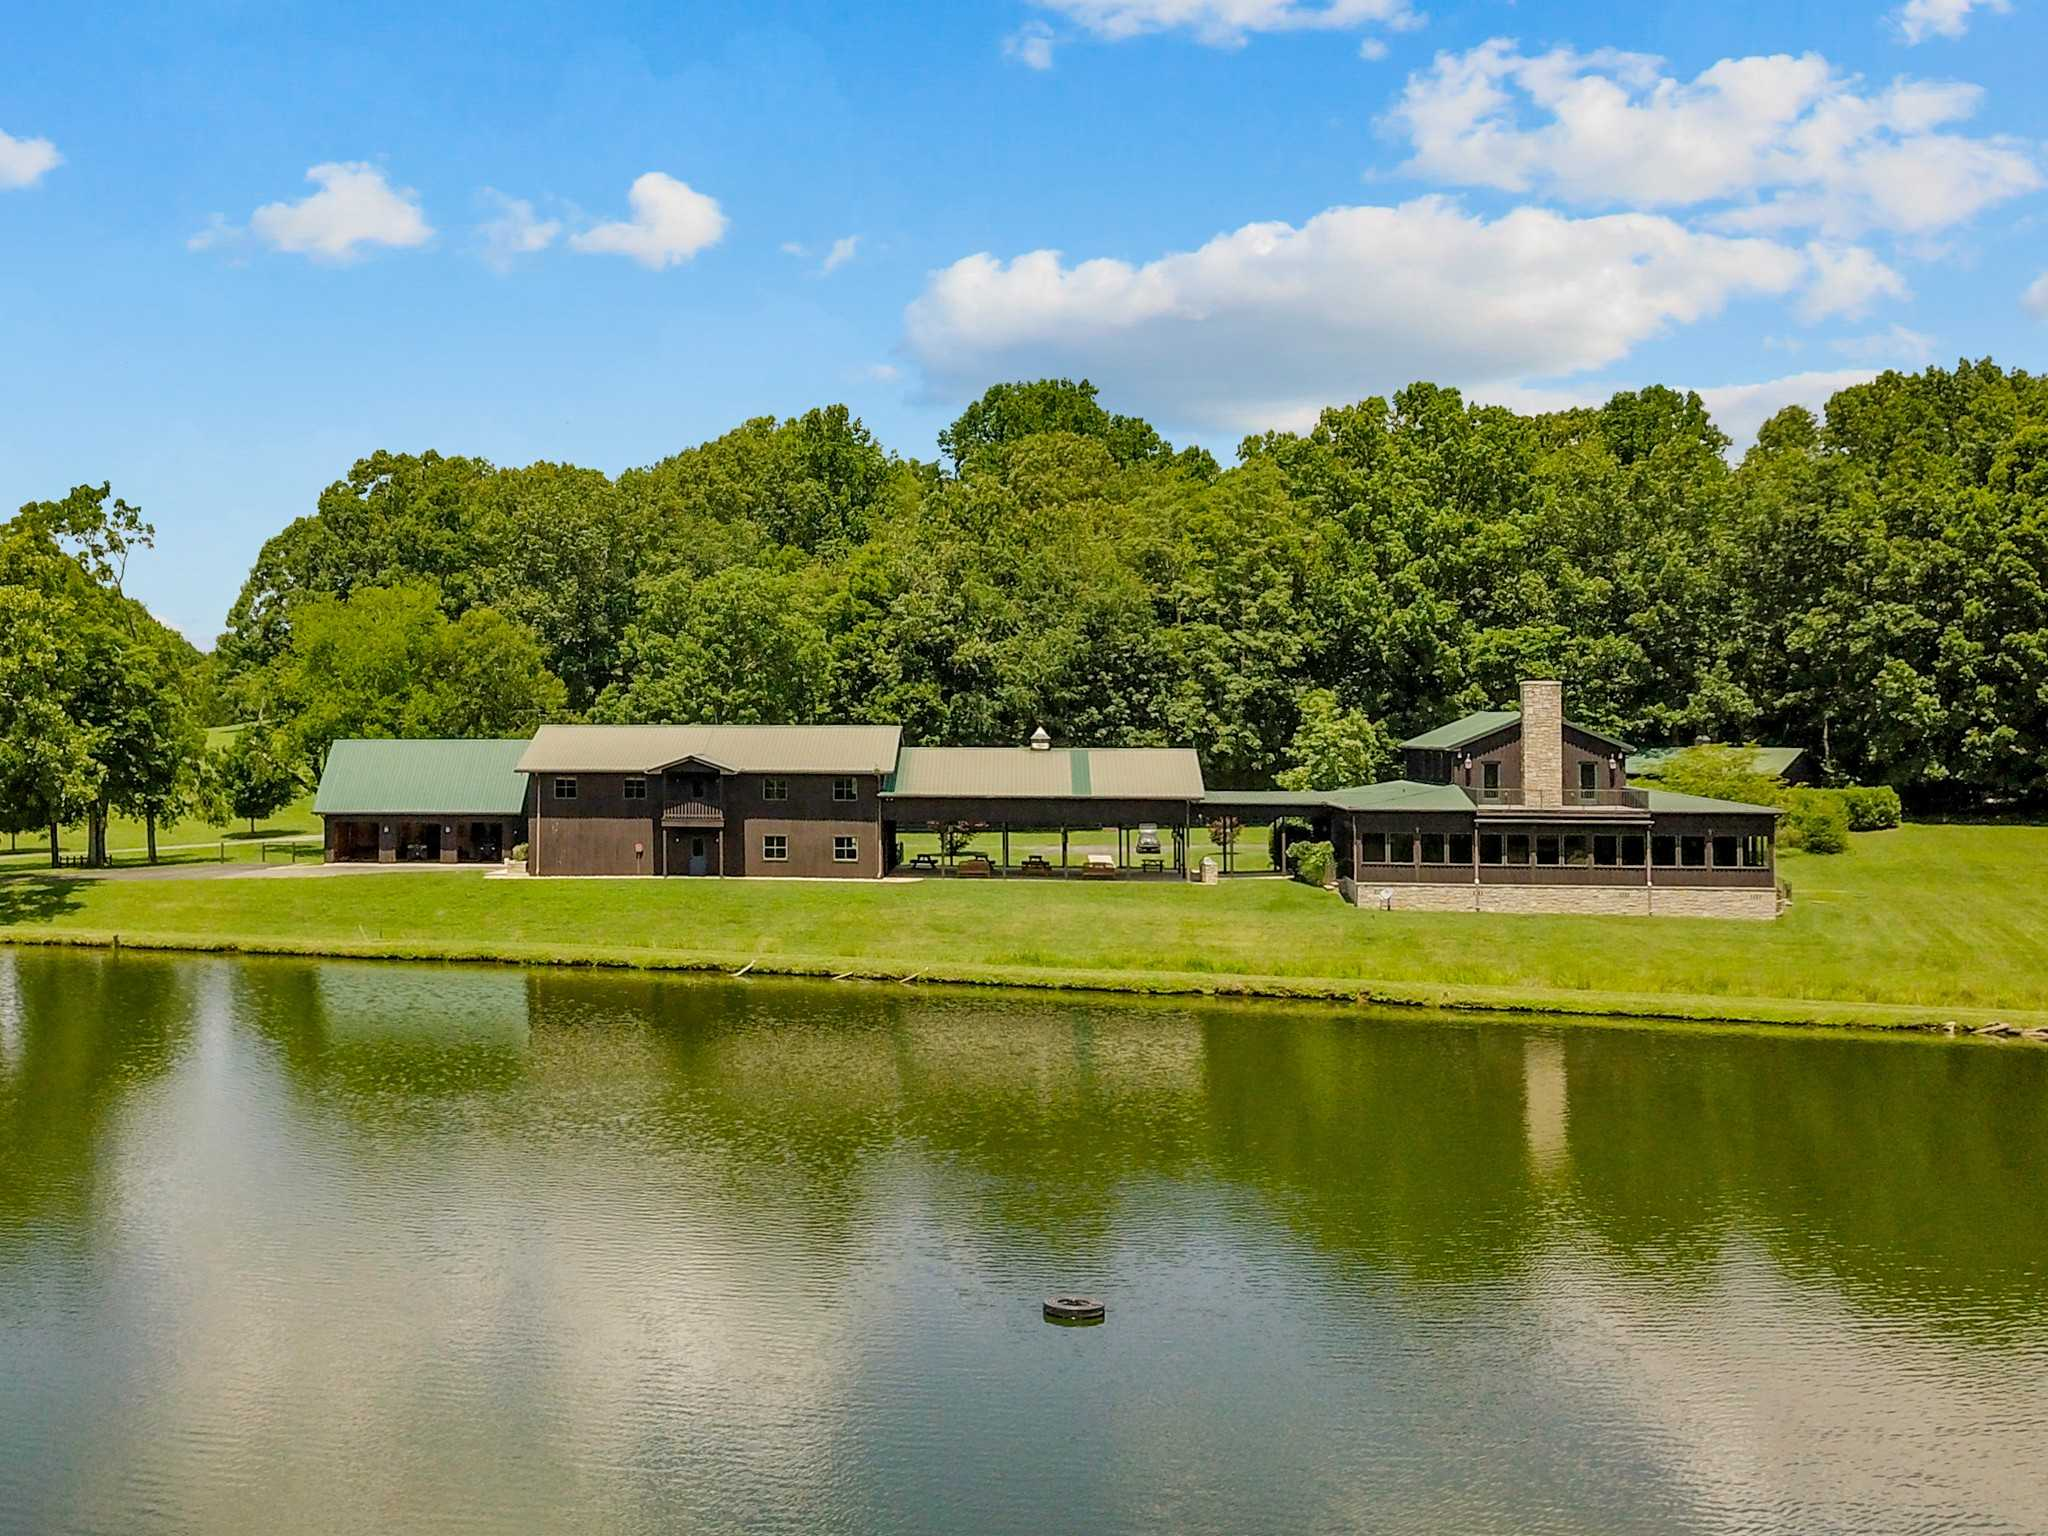 $12,980,000 - 4Br/4Ba -  for Sale in Rolling Hill Retreat, Franklin